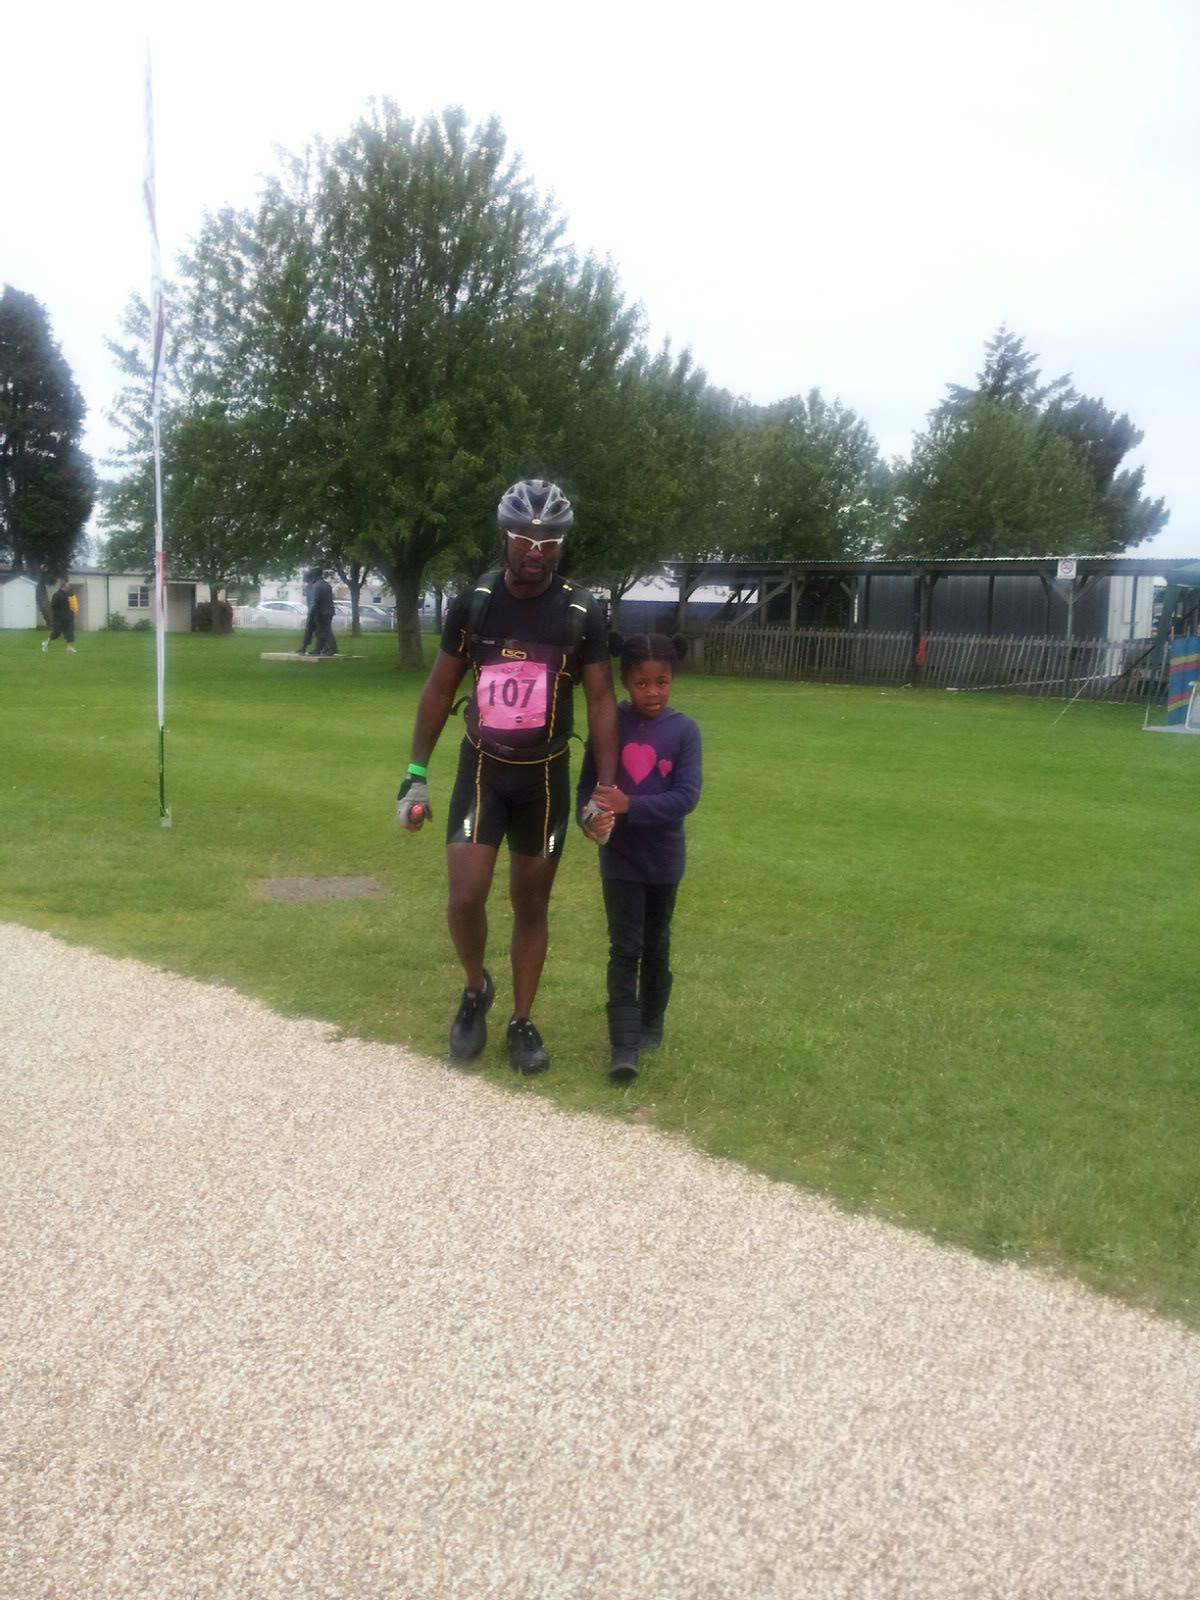 Ride 24 – taking a short break (232.8 miles - in One Day)